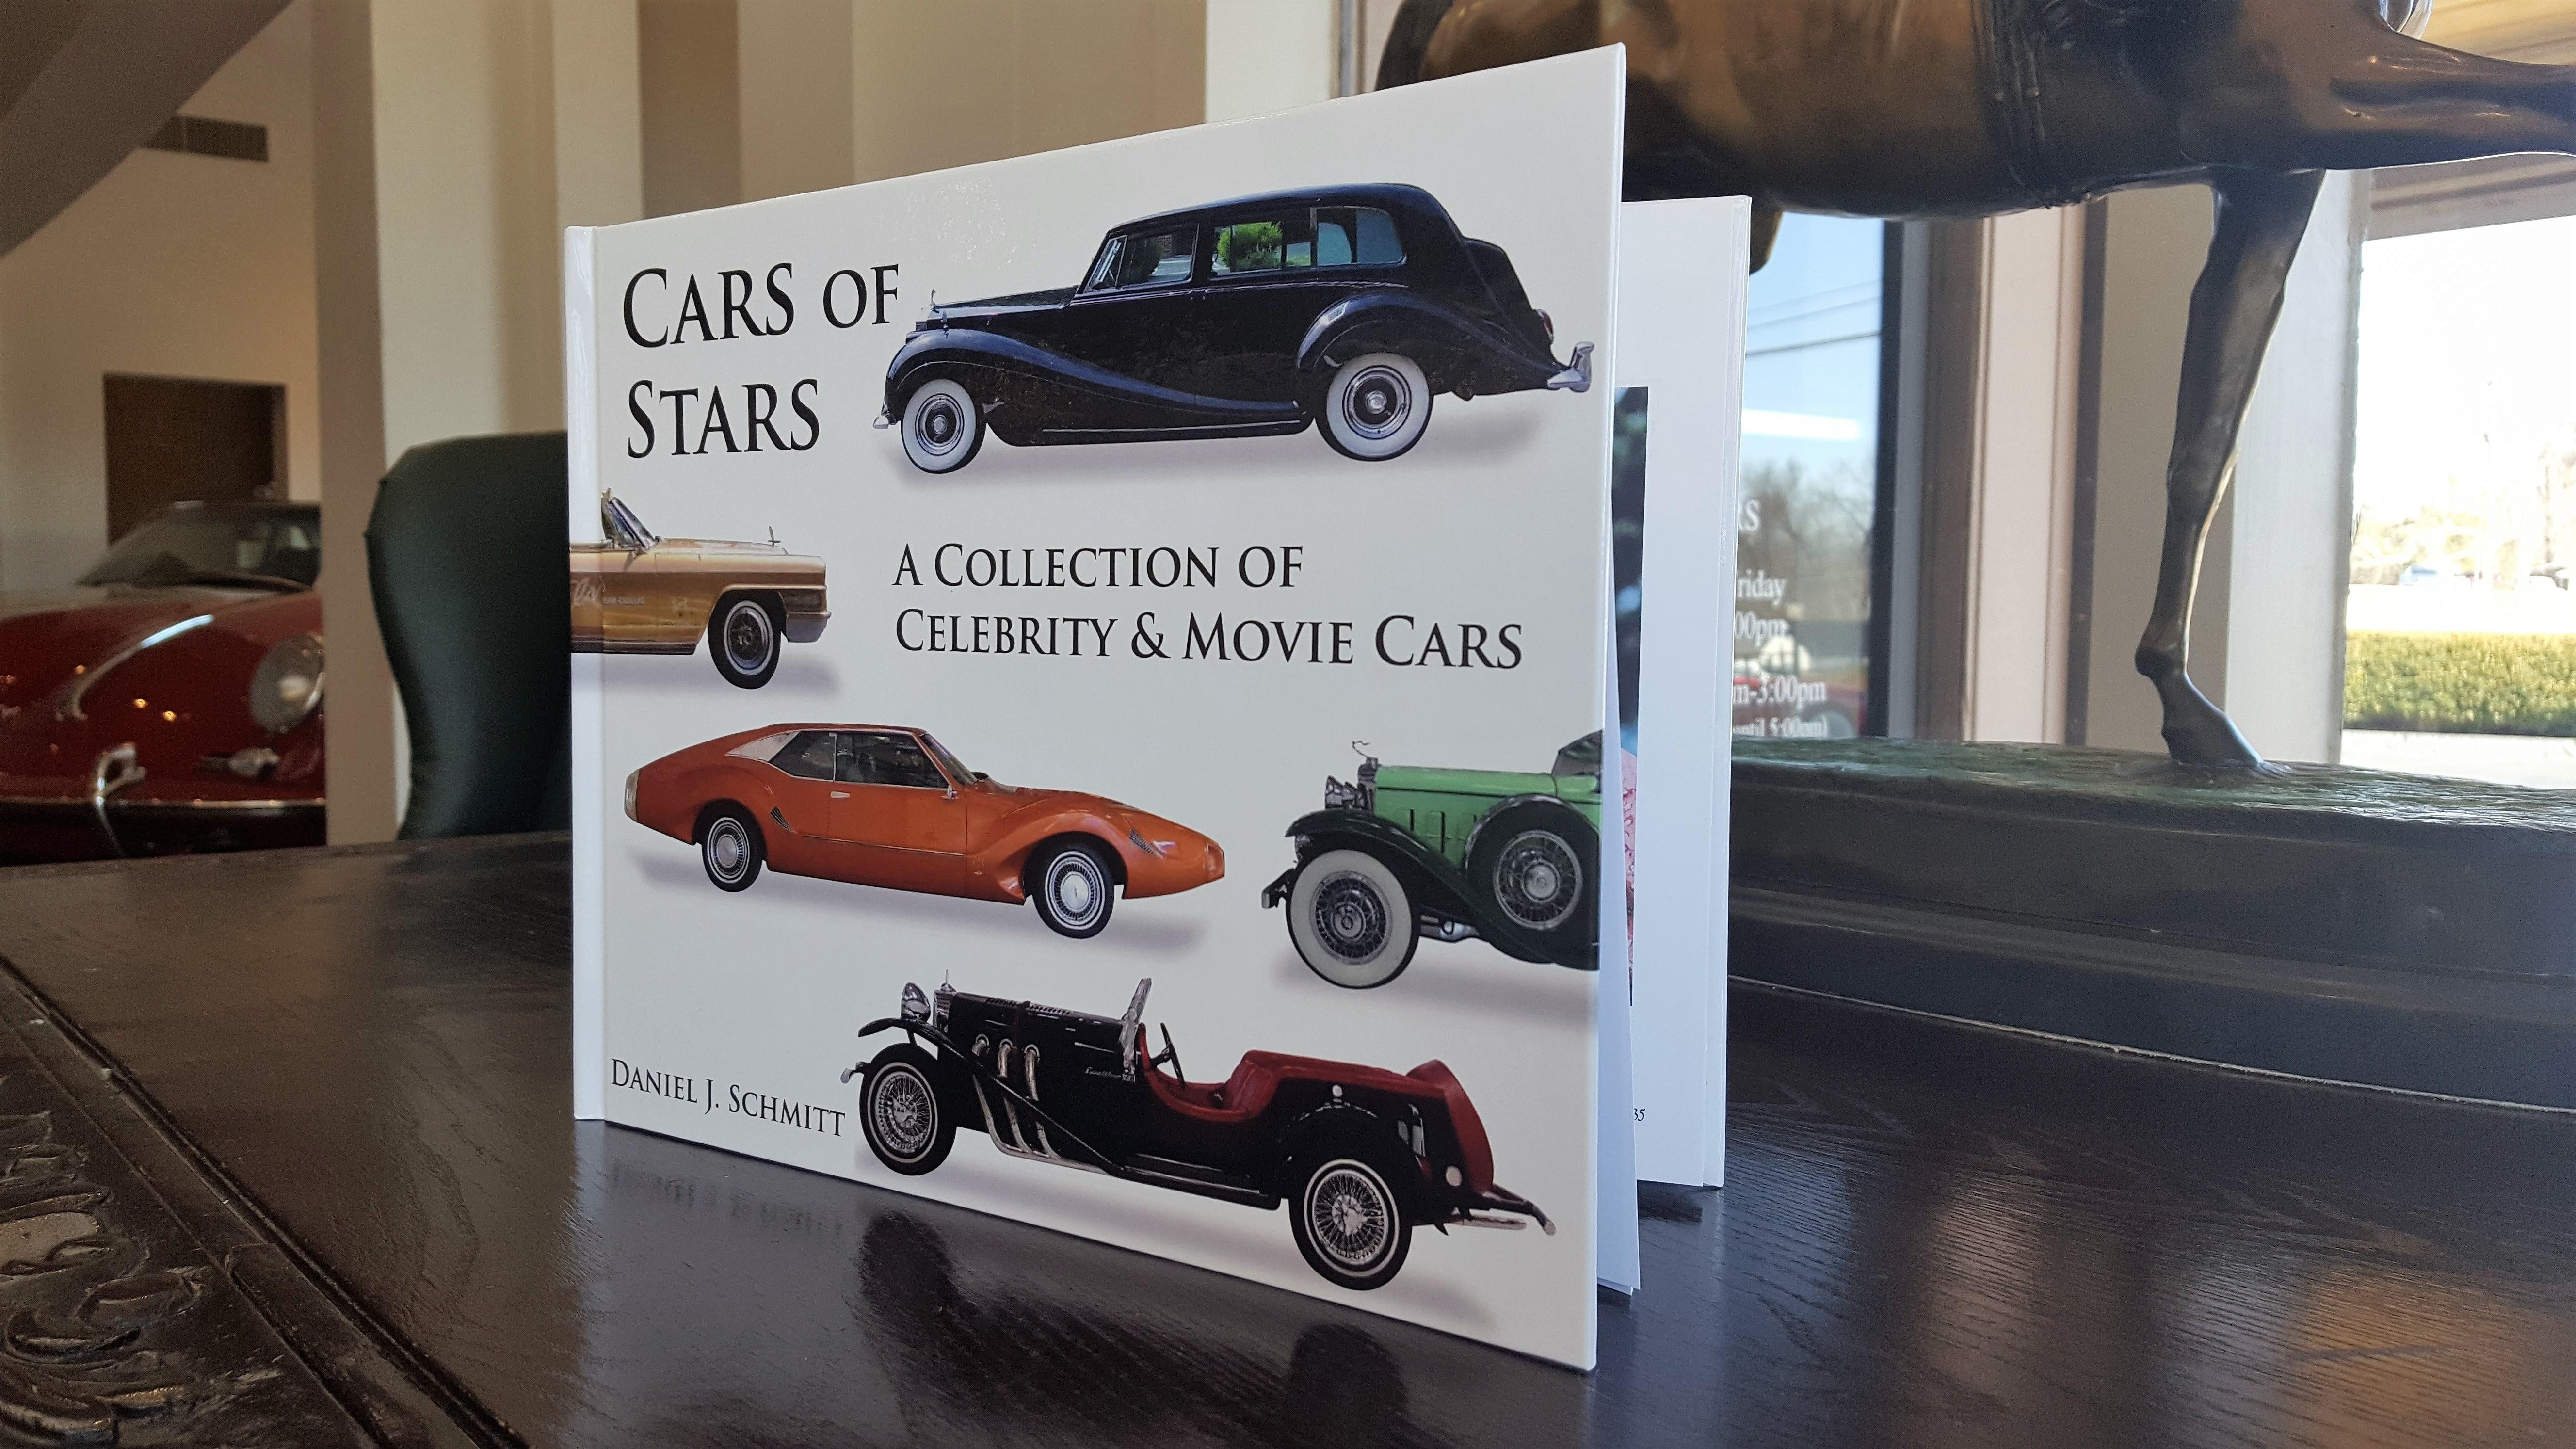 Daniel J. Schmitt Cars of Stars book, premium collector cars for sale